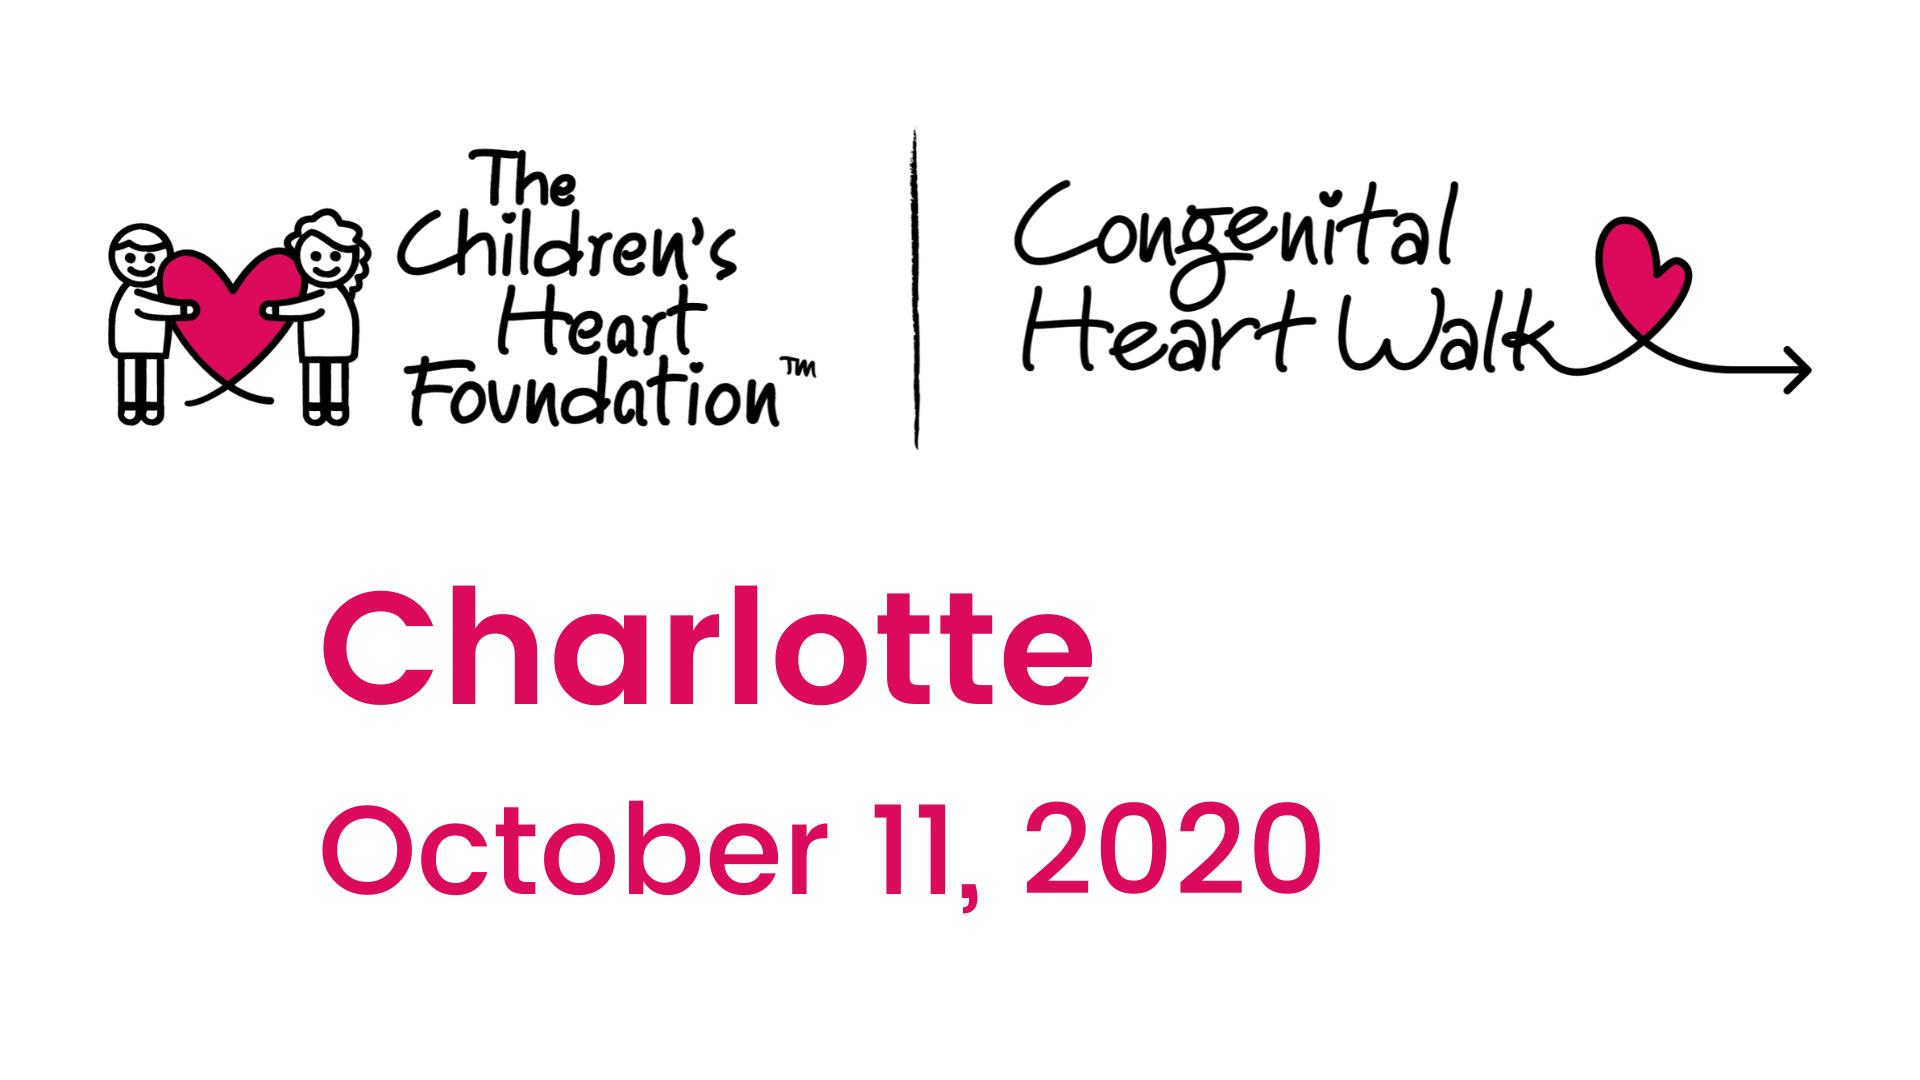 Charlotte Congenital Heart Walk (North Carolina)